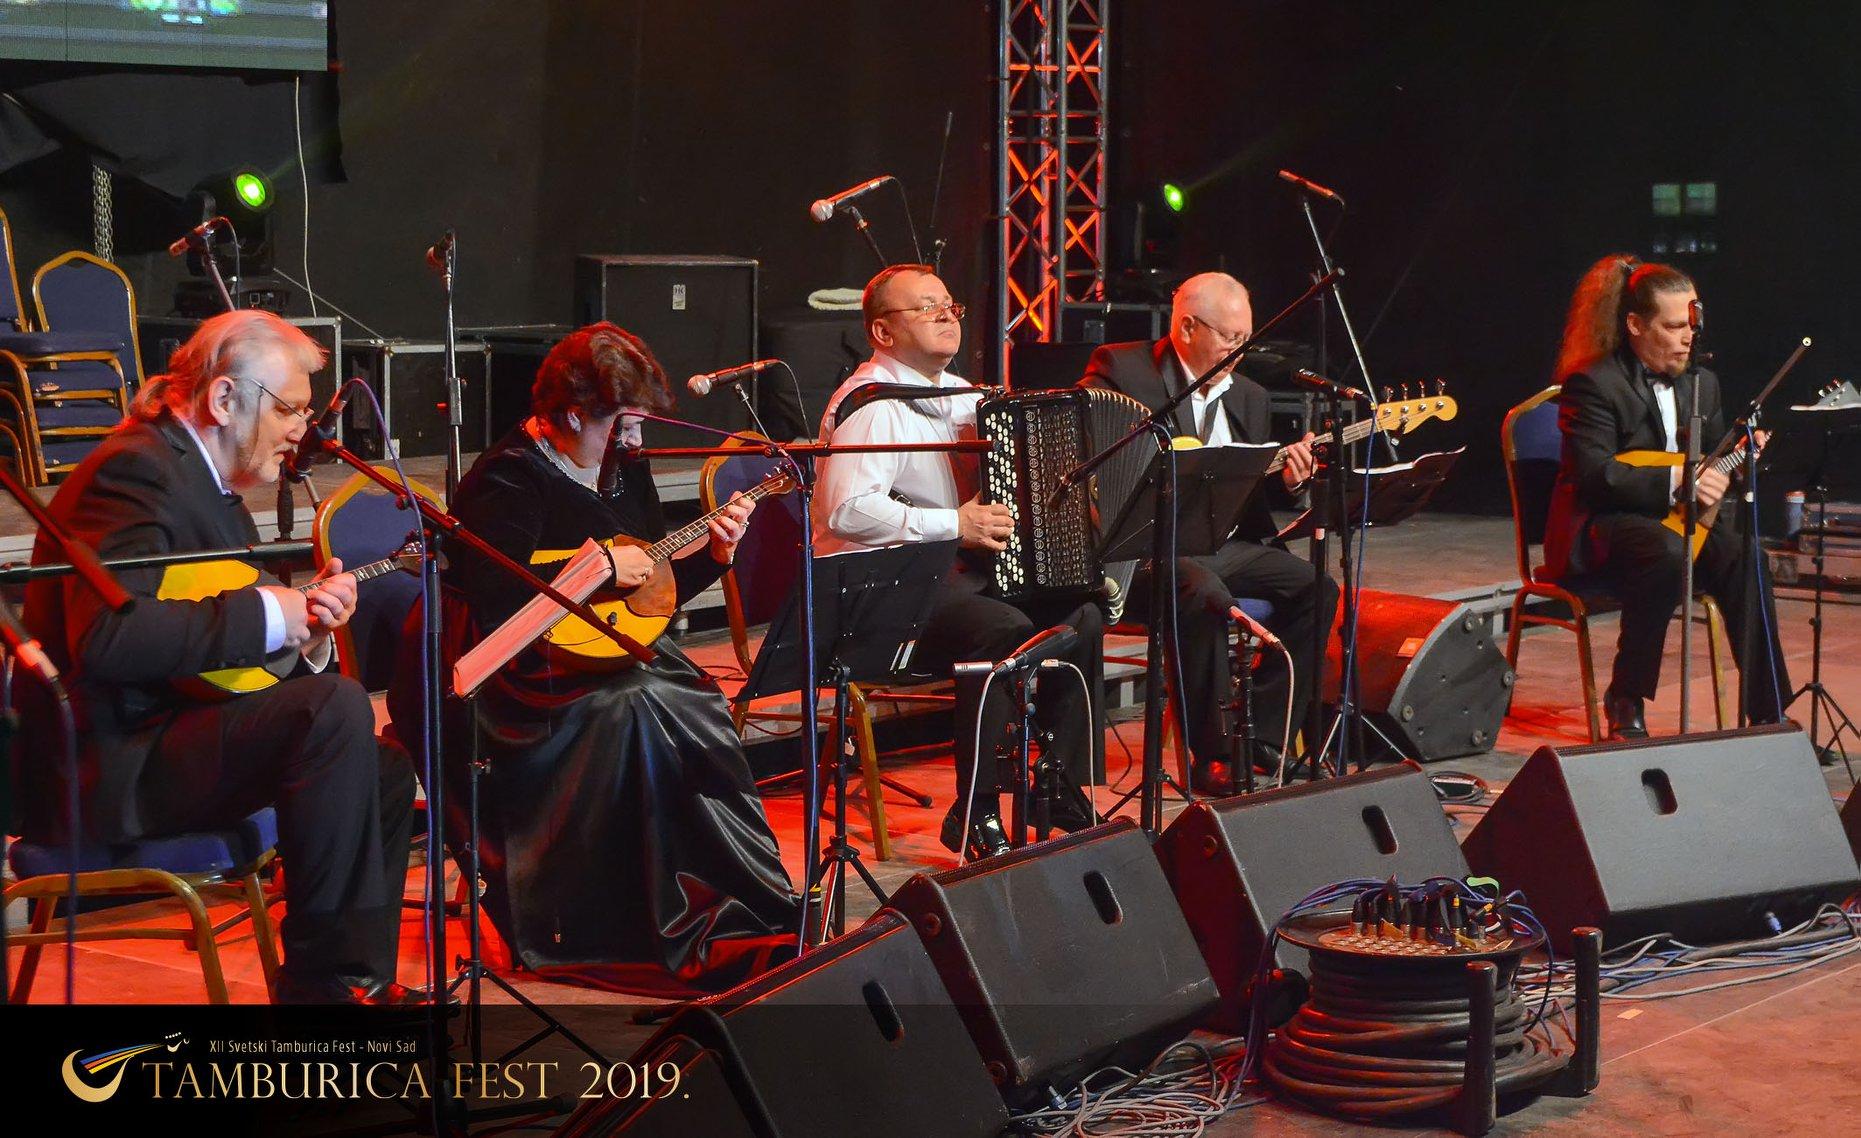 XII Международный фестиваль «Тамбурица фест»